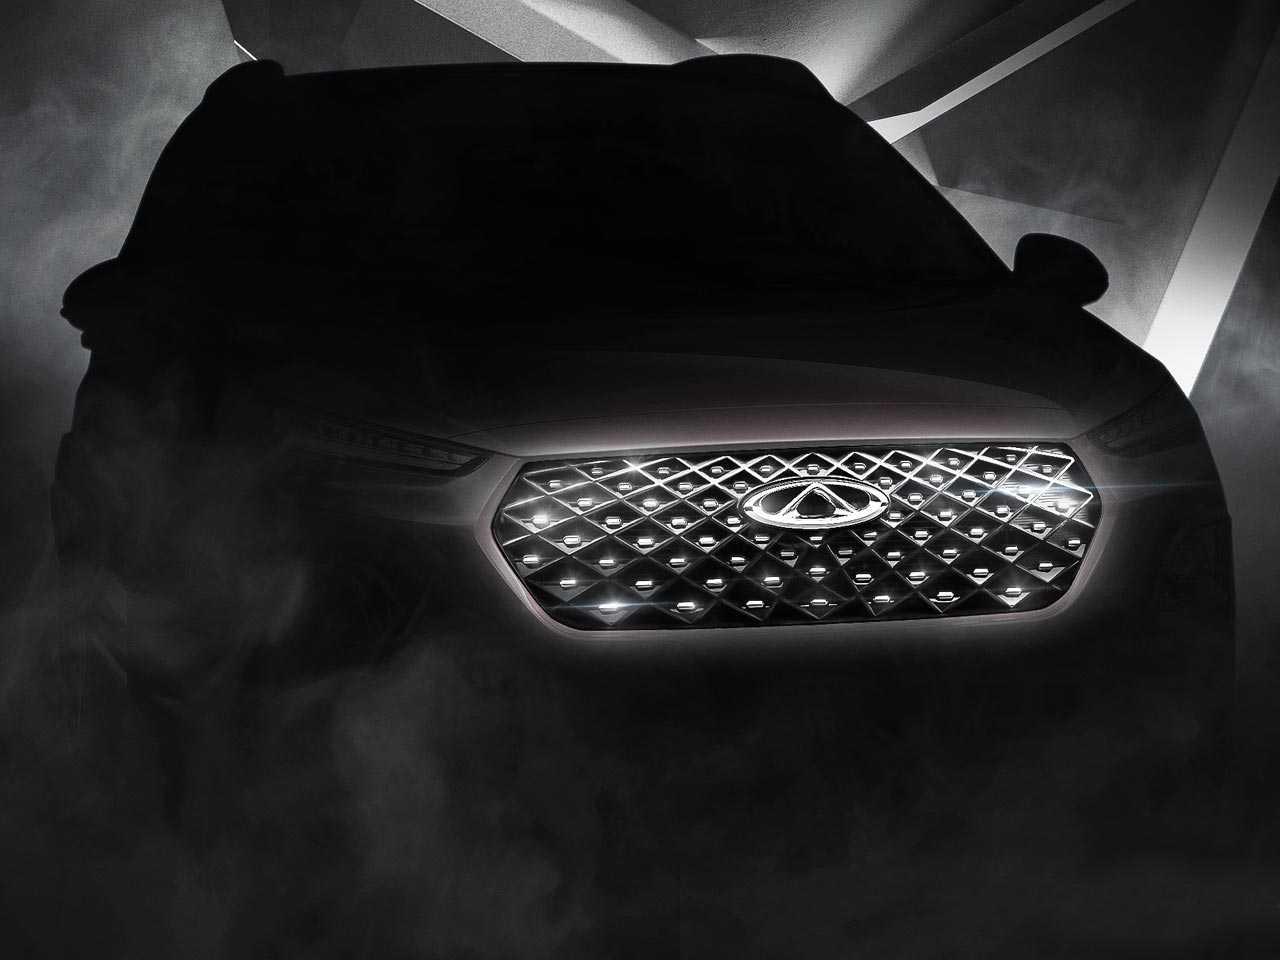 Primeiro teaser oficial do novo SUV da CAOA Chery: facelift do Tiggo 2 deve estrar no Brasil como Tiggo 3X Plus